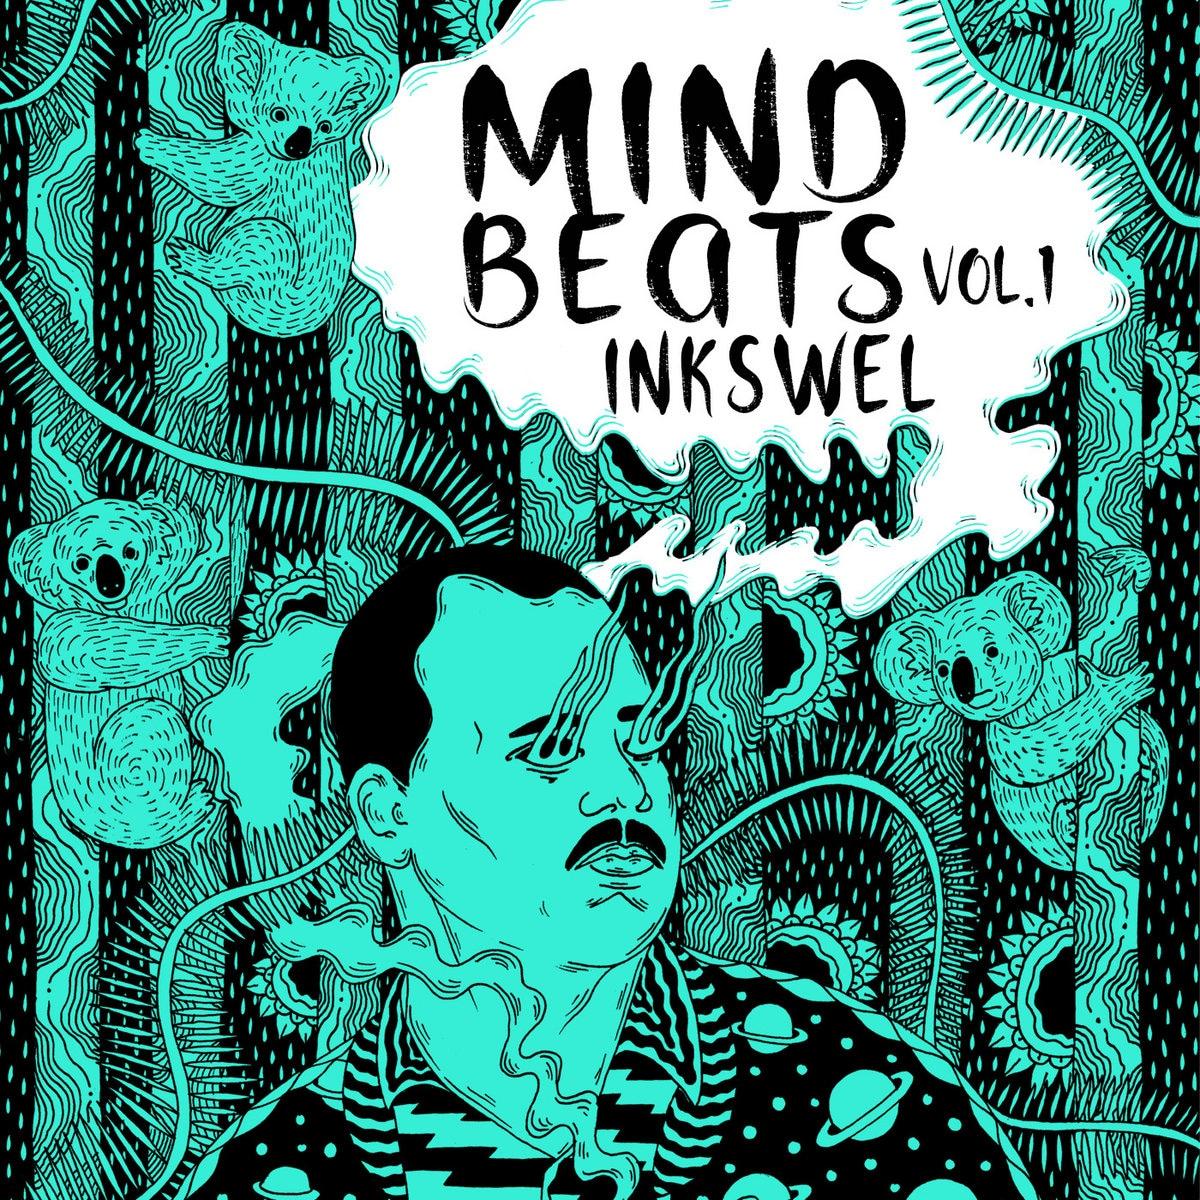 Inkswel Mind Beats